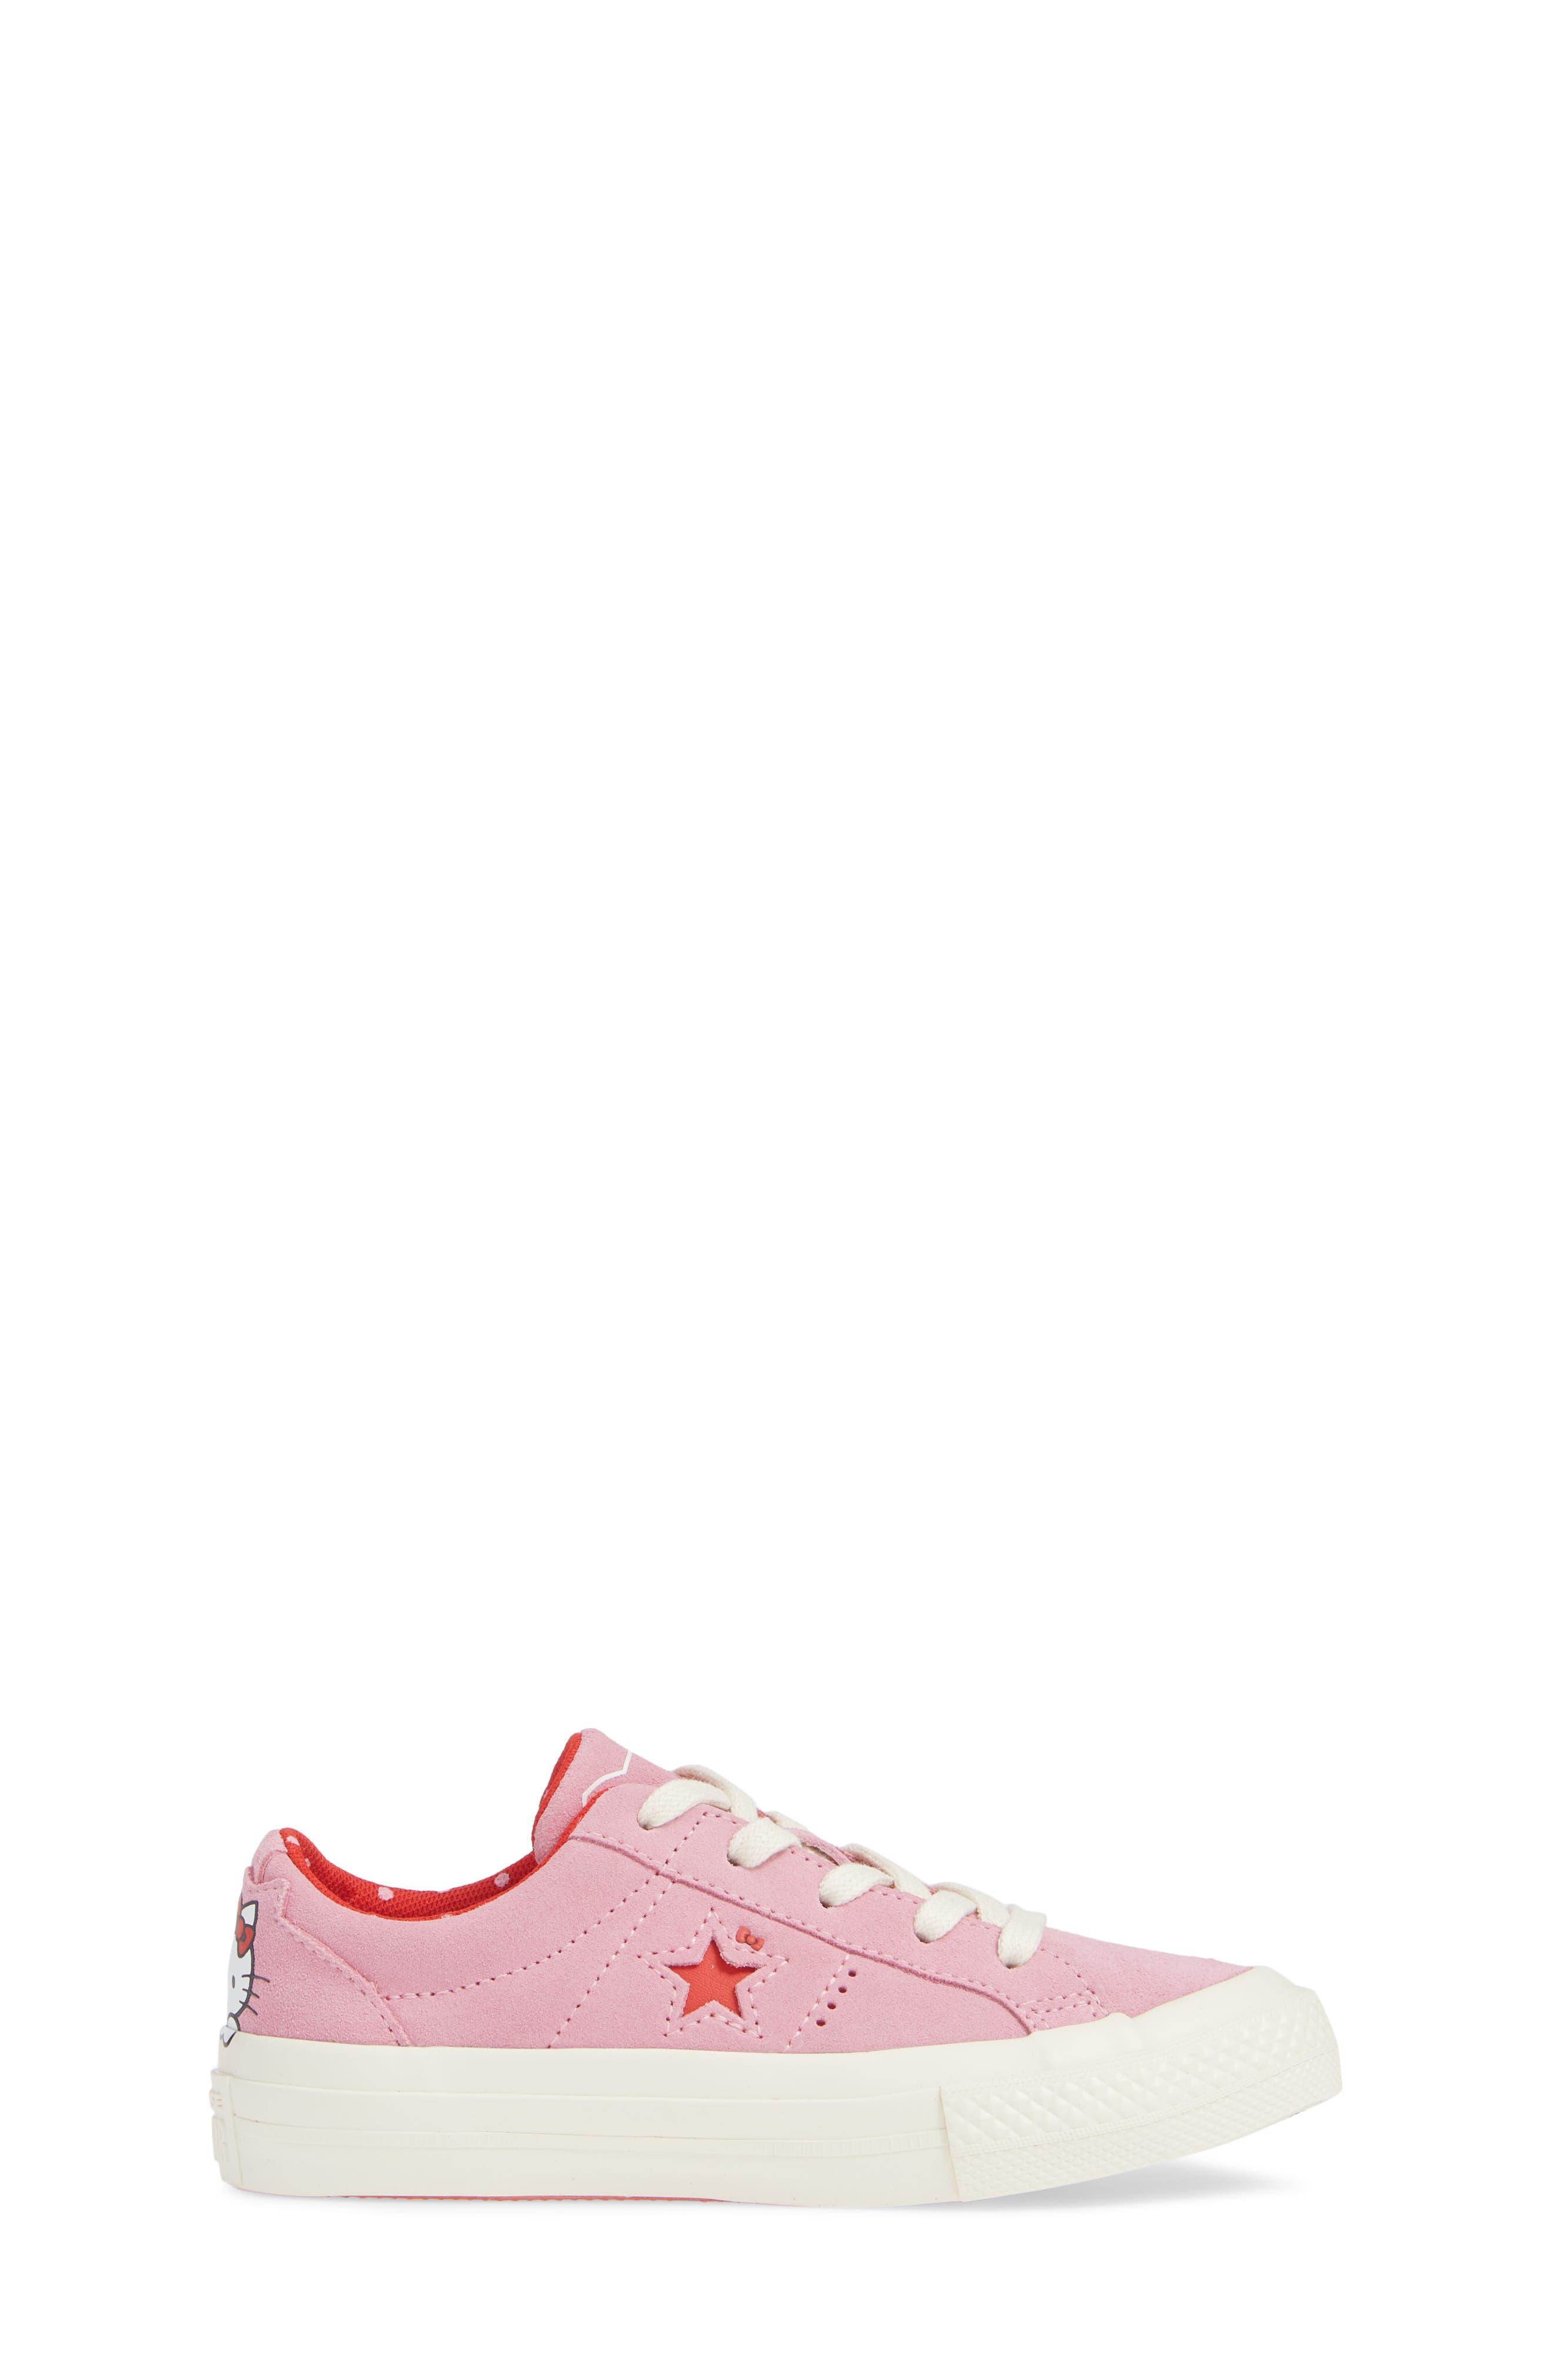 CONVERSE One Star Hello Kitty® Sneaker.  3-M